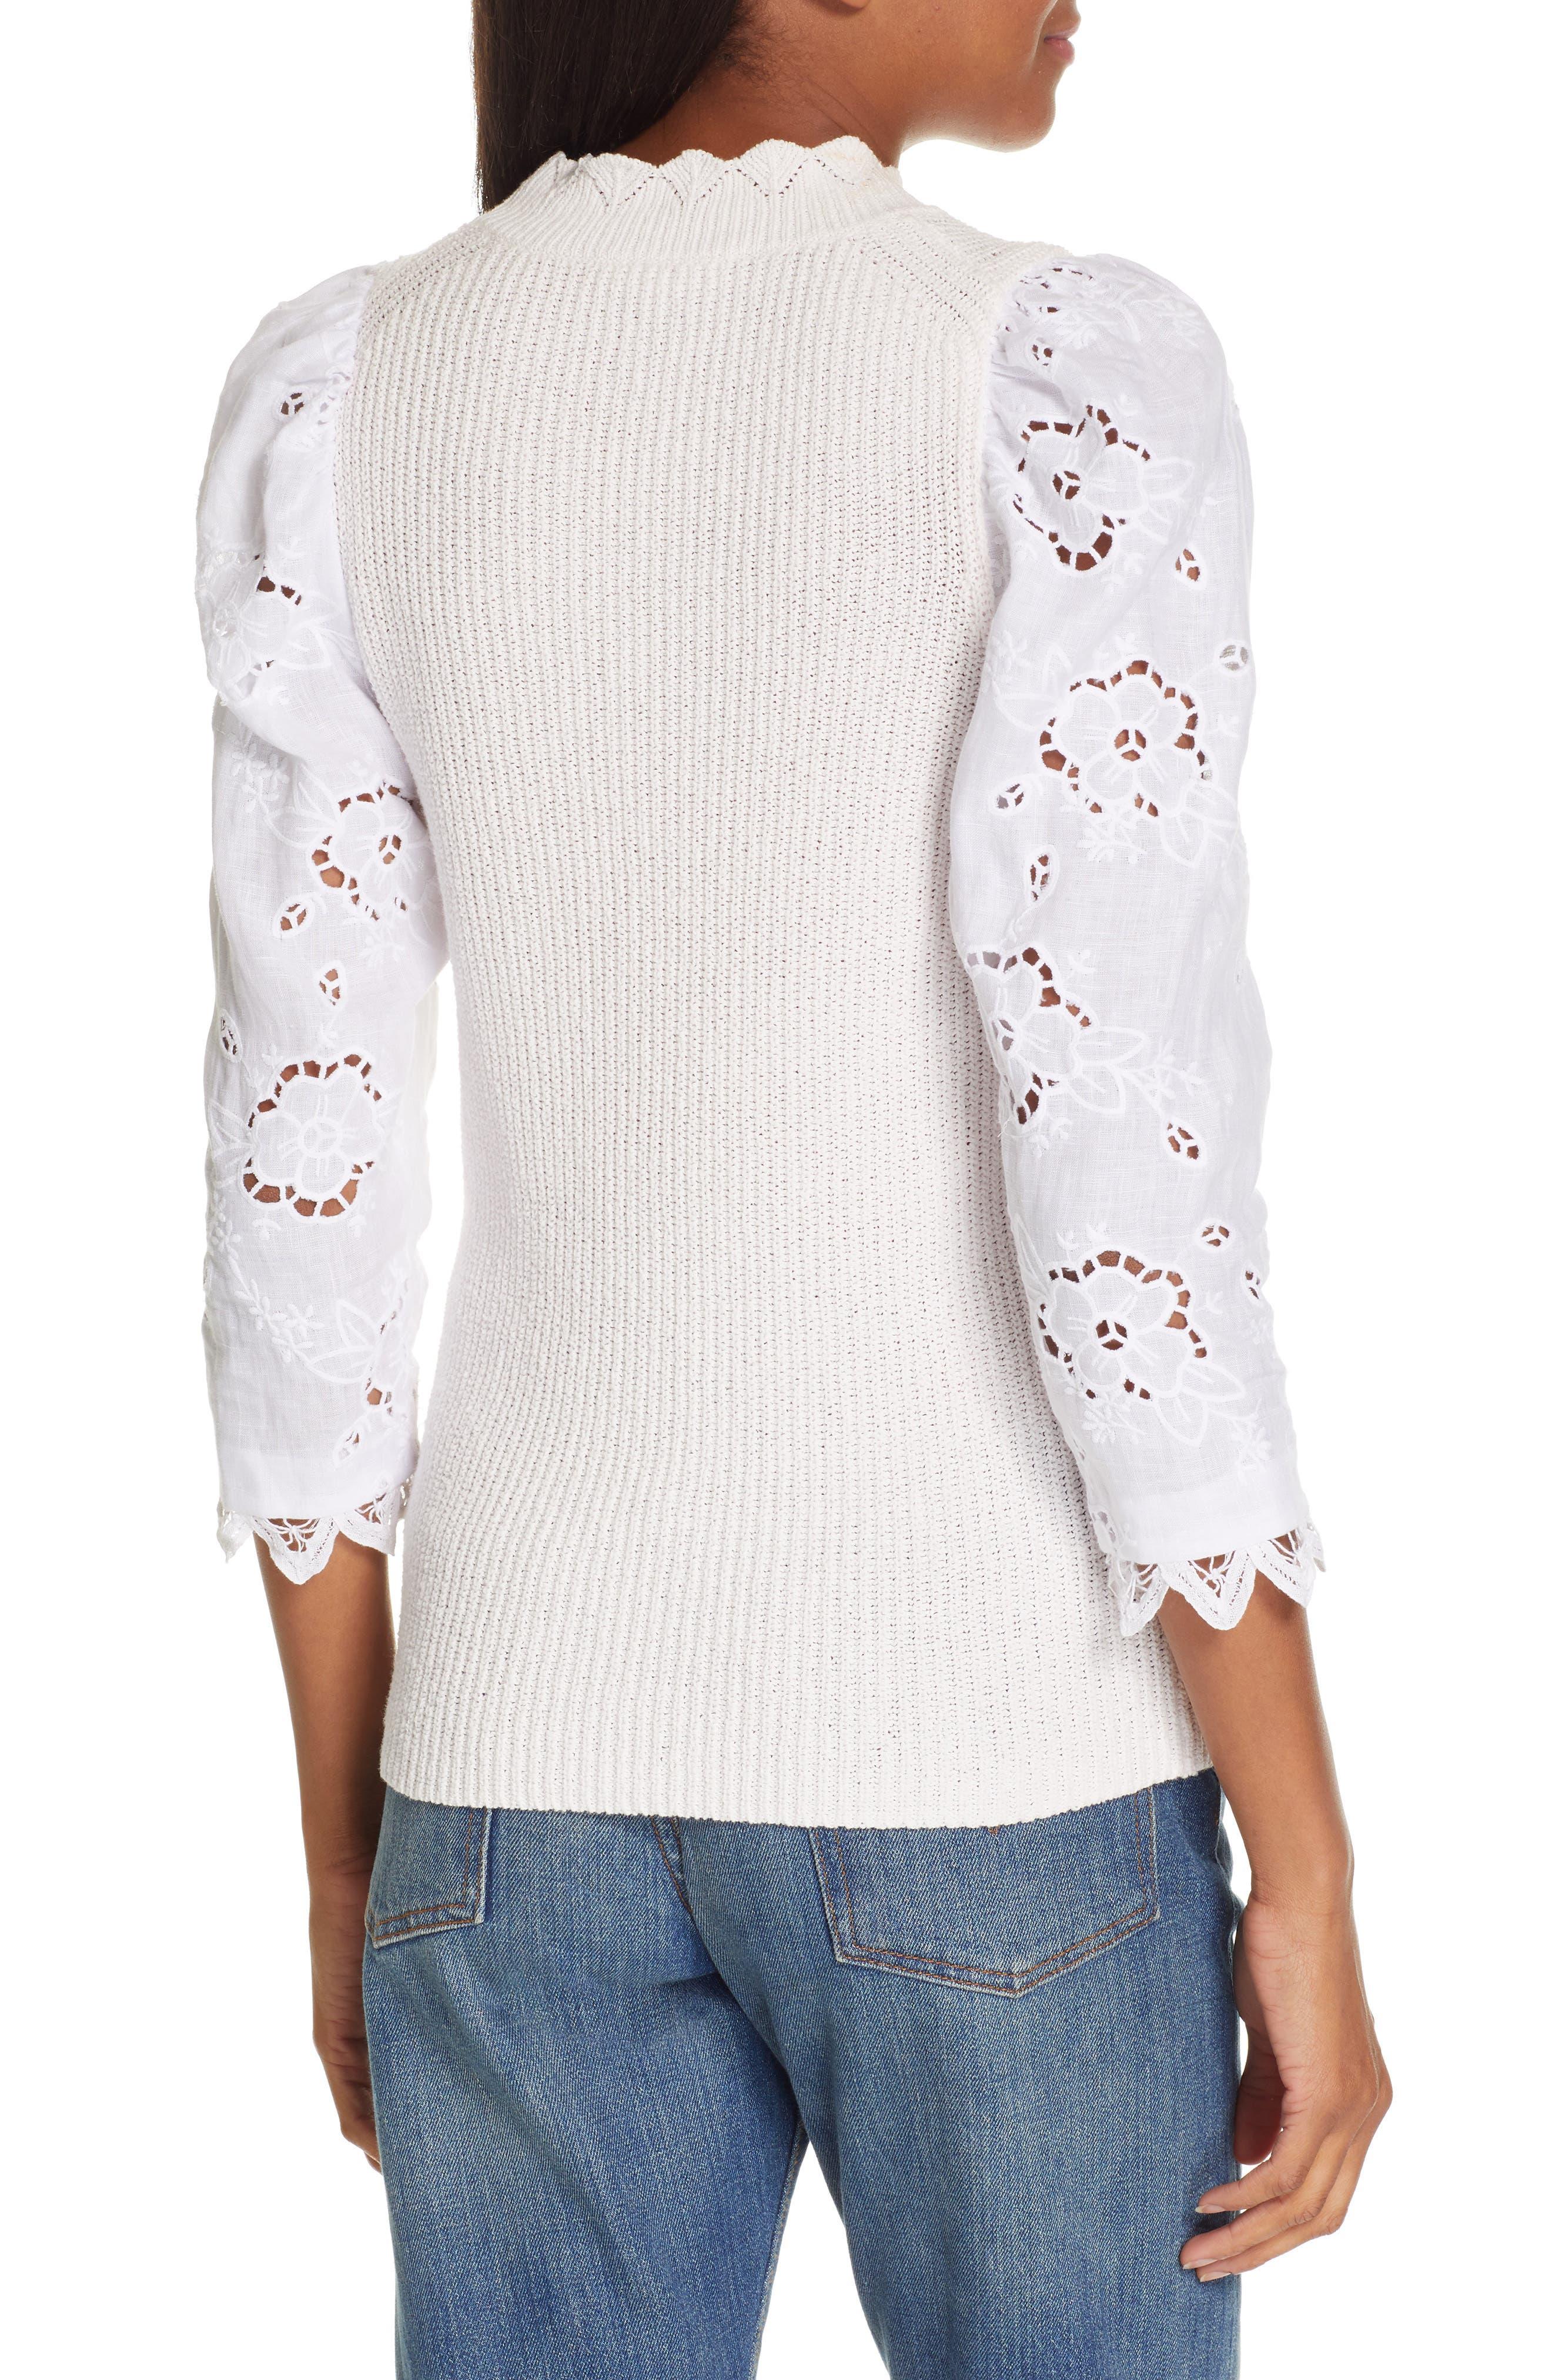 REBECCA TAYLOR, Mix Media Eyelet Sleeve Cotton Sweater, Alternate thumbnail 2, color, WASHED PETAL